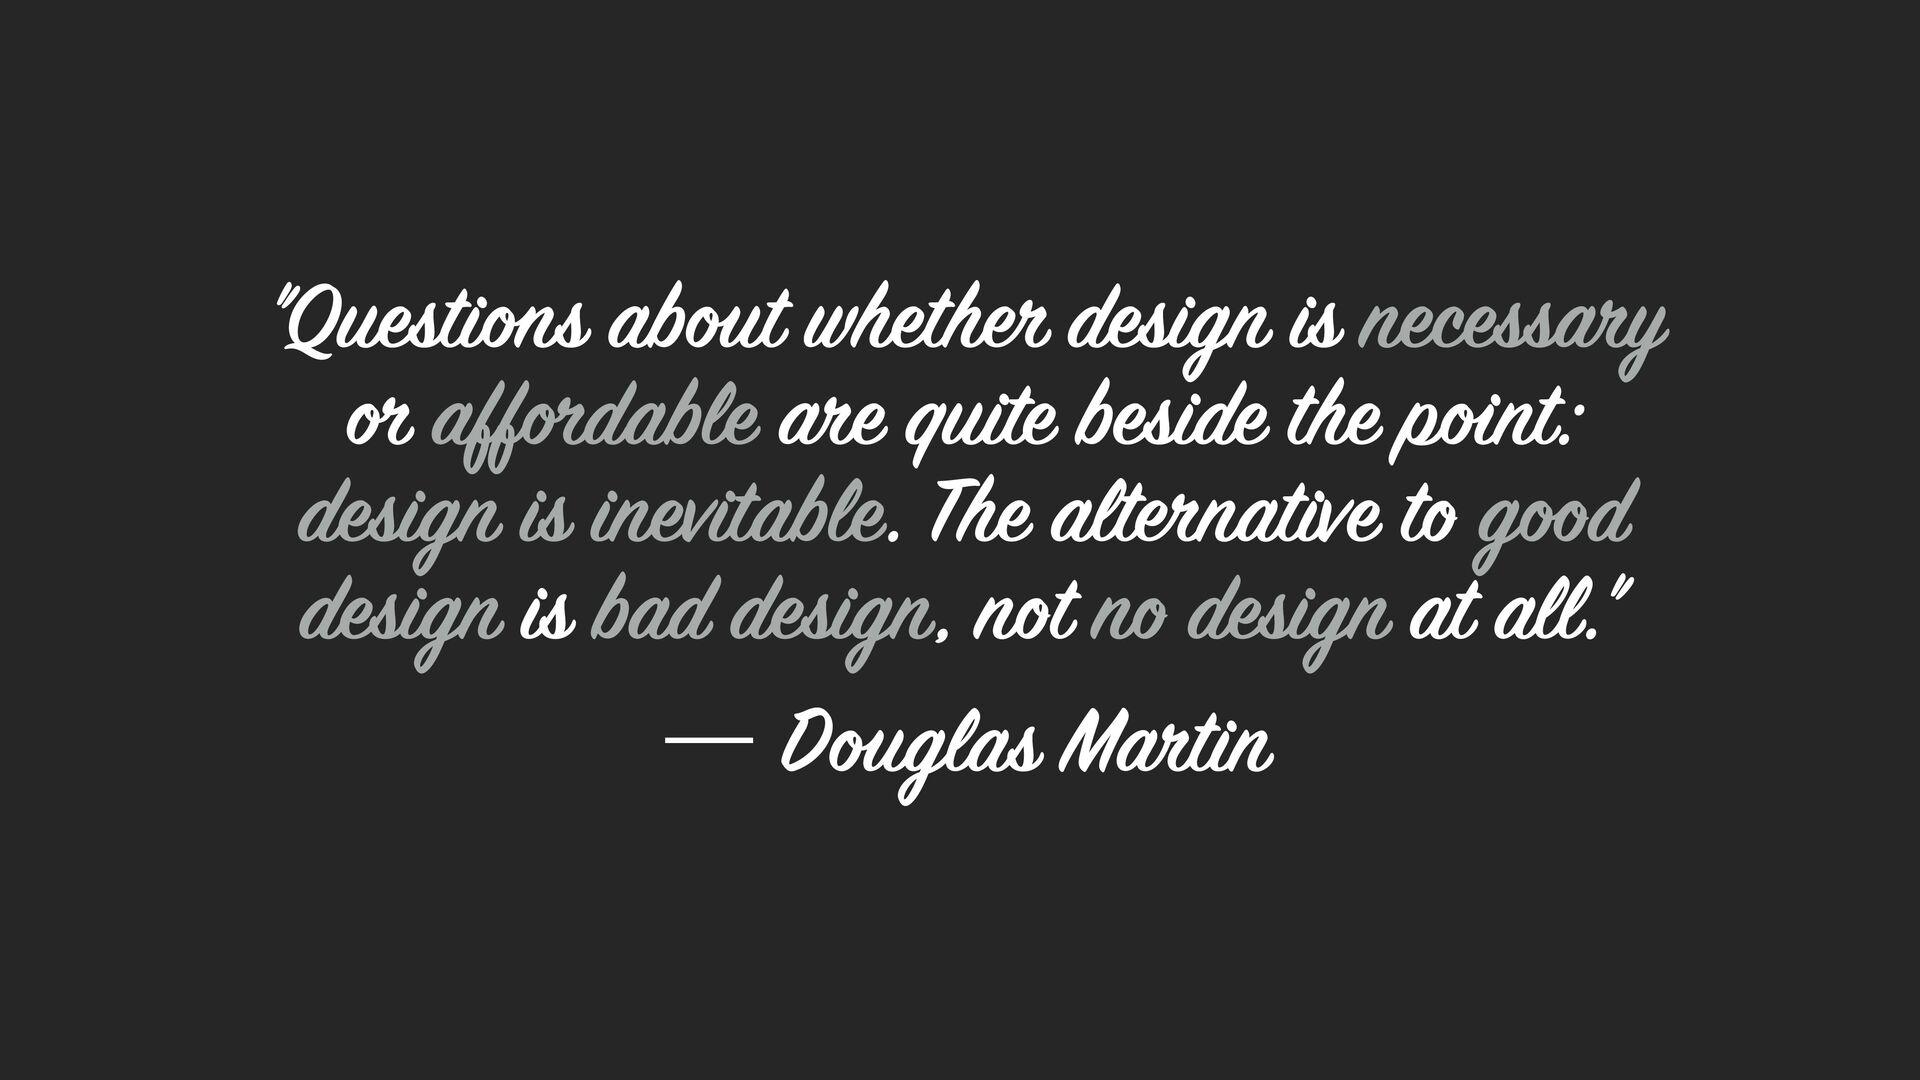 Arquitetura  model-view-controller